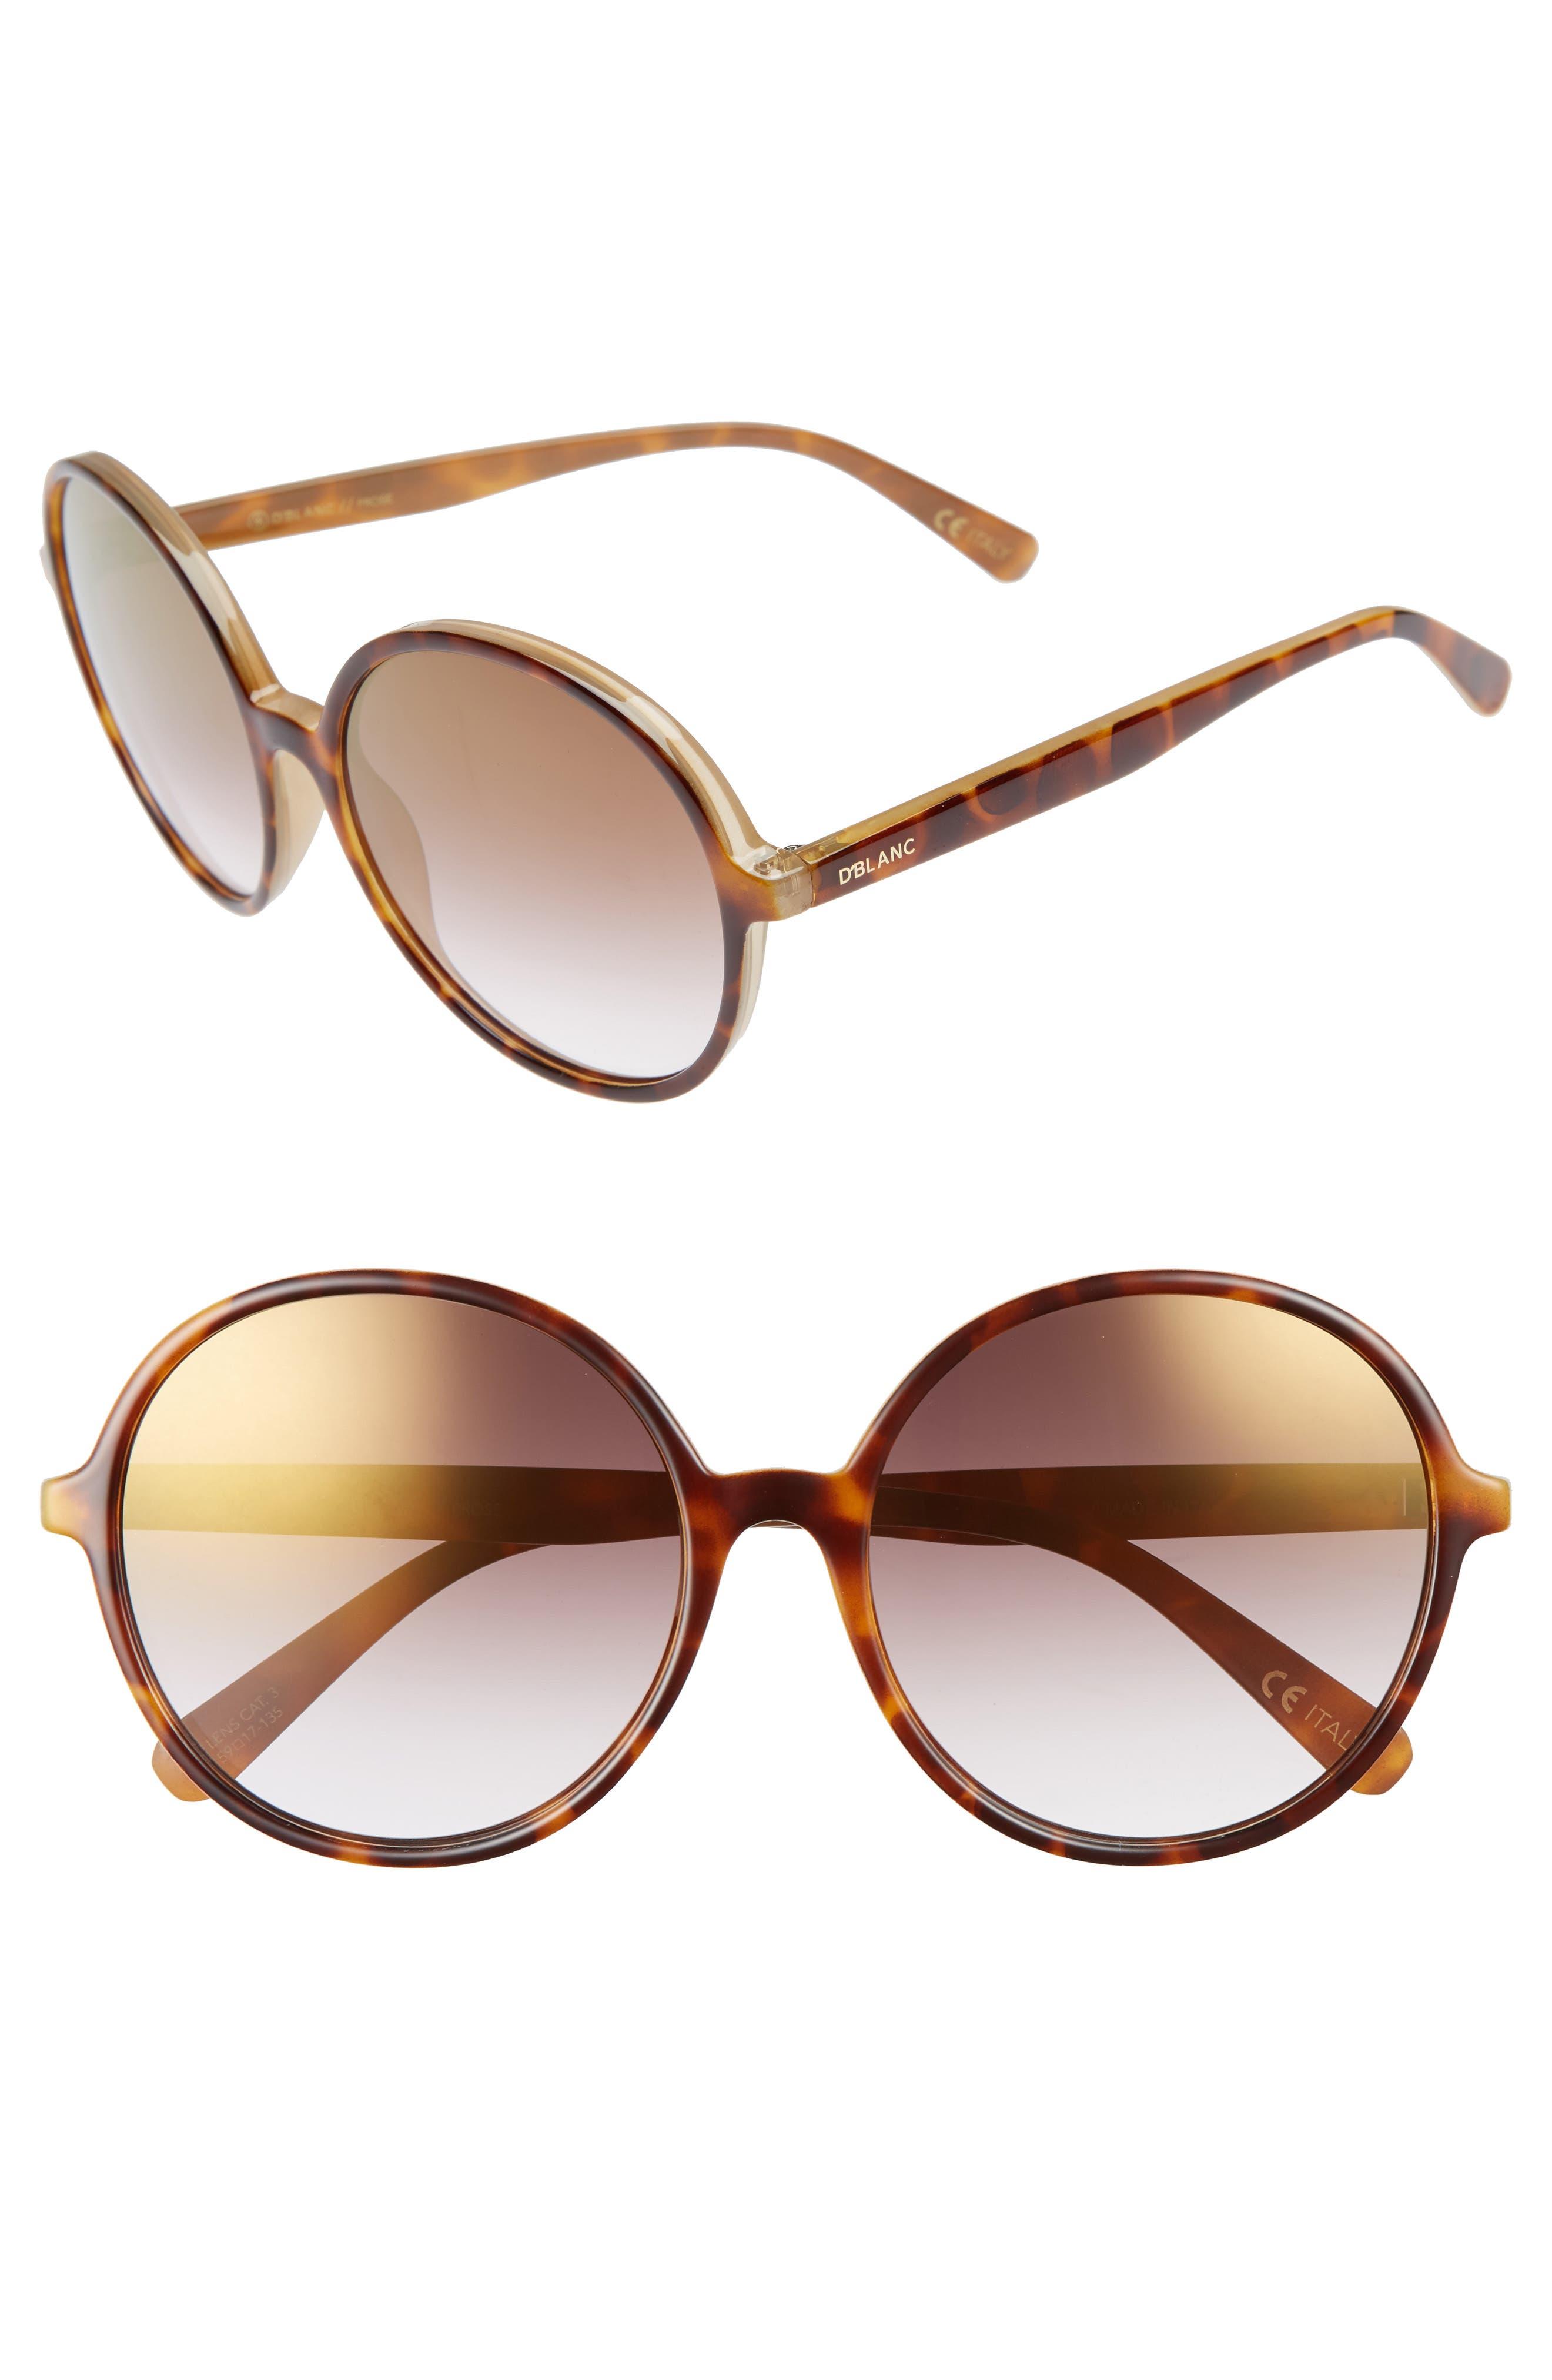 DBLANC DBLANC Prose 59mm Round Sunglasses